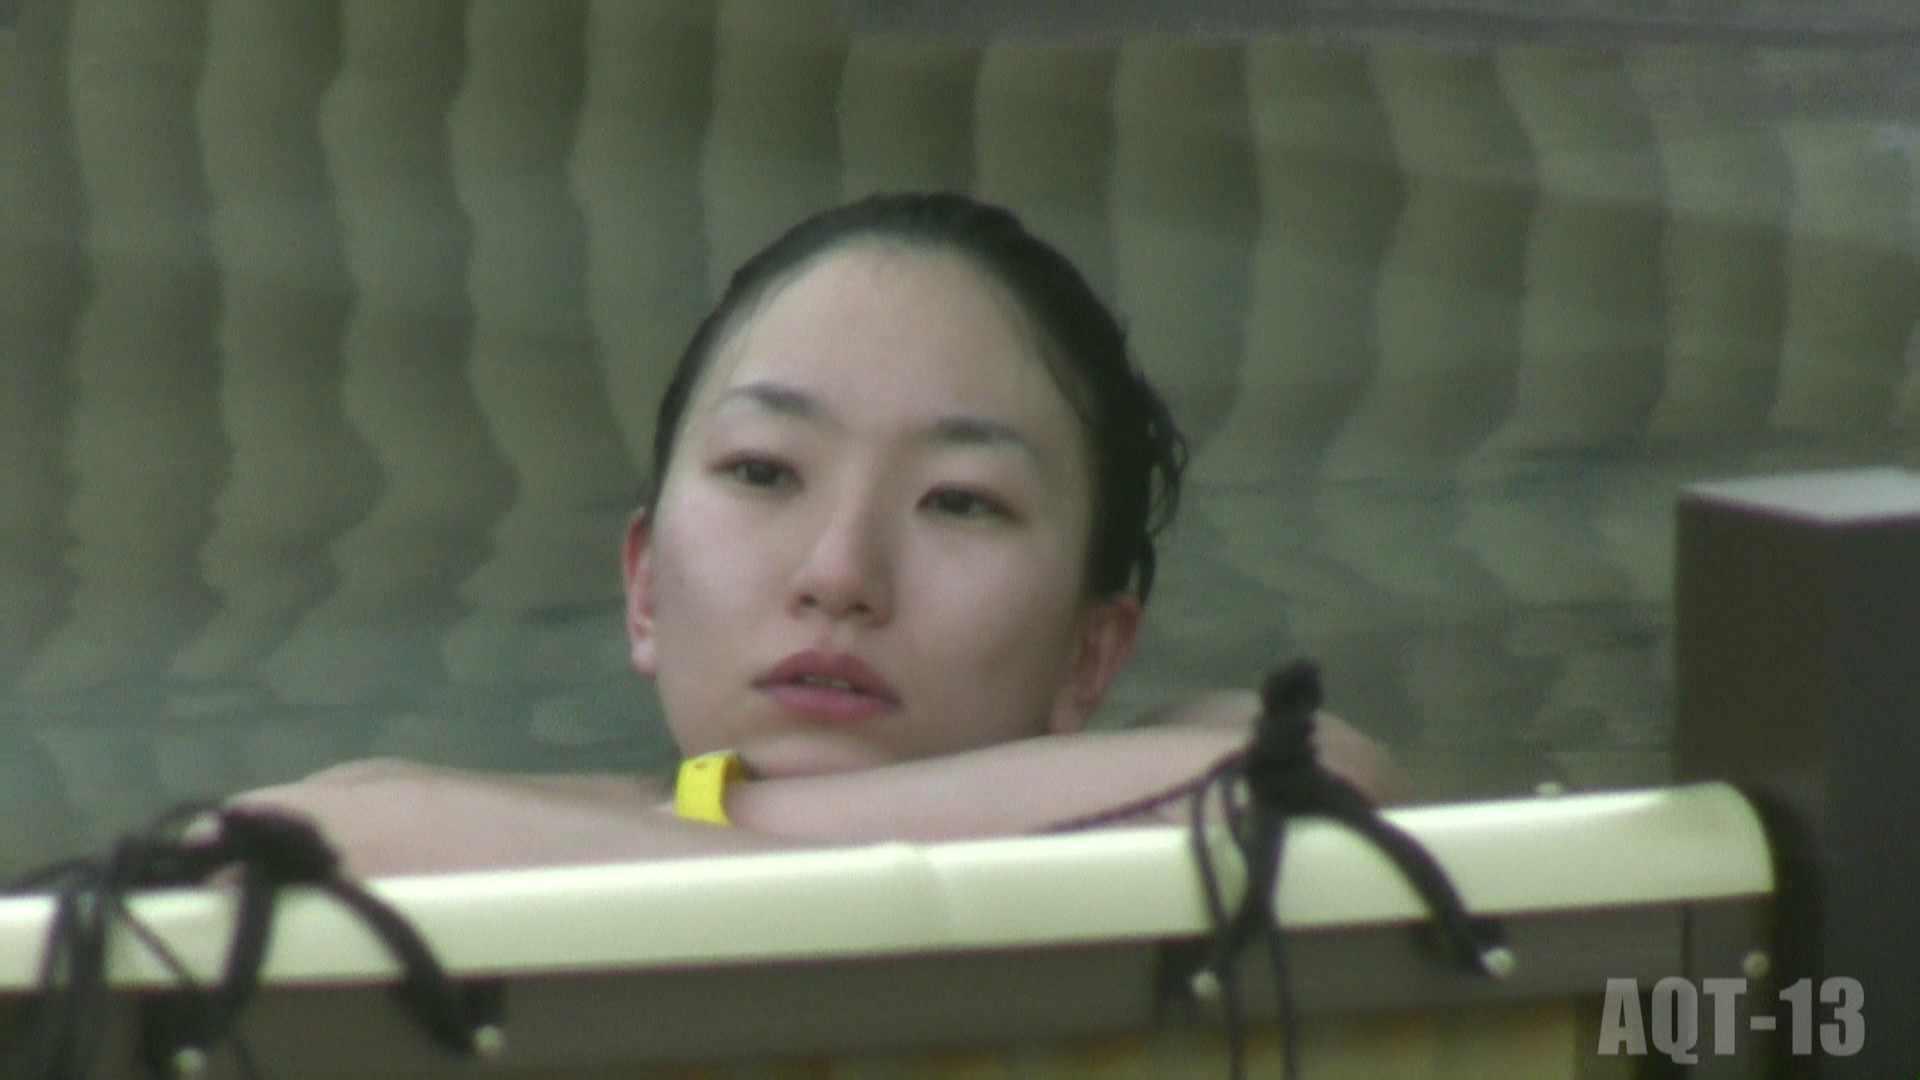 Aquaな露天風呂Vol.818 露天風呂突入 盗み撮り動画キャプチャ 71pic 17